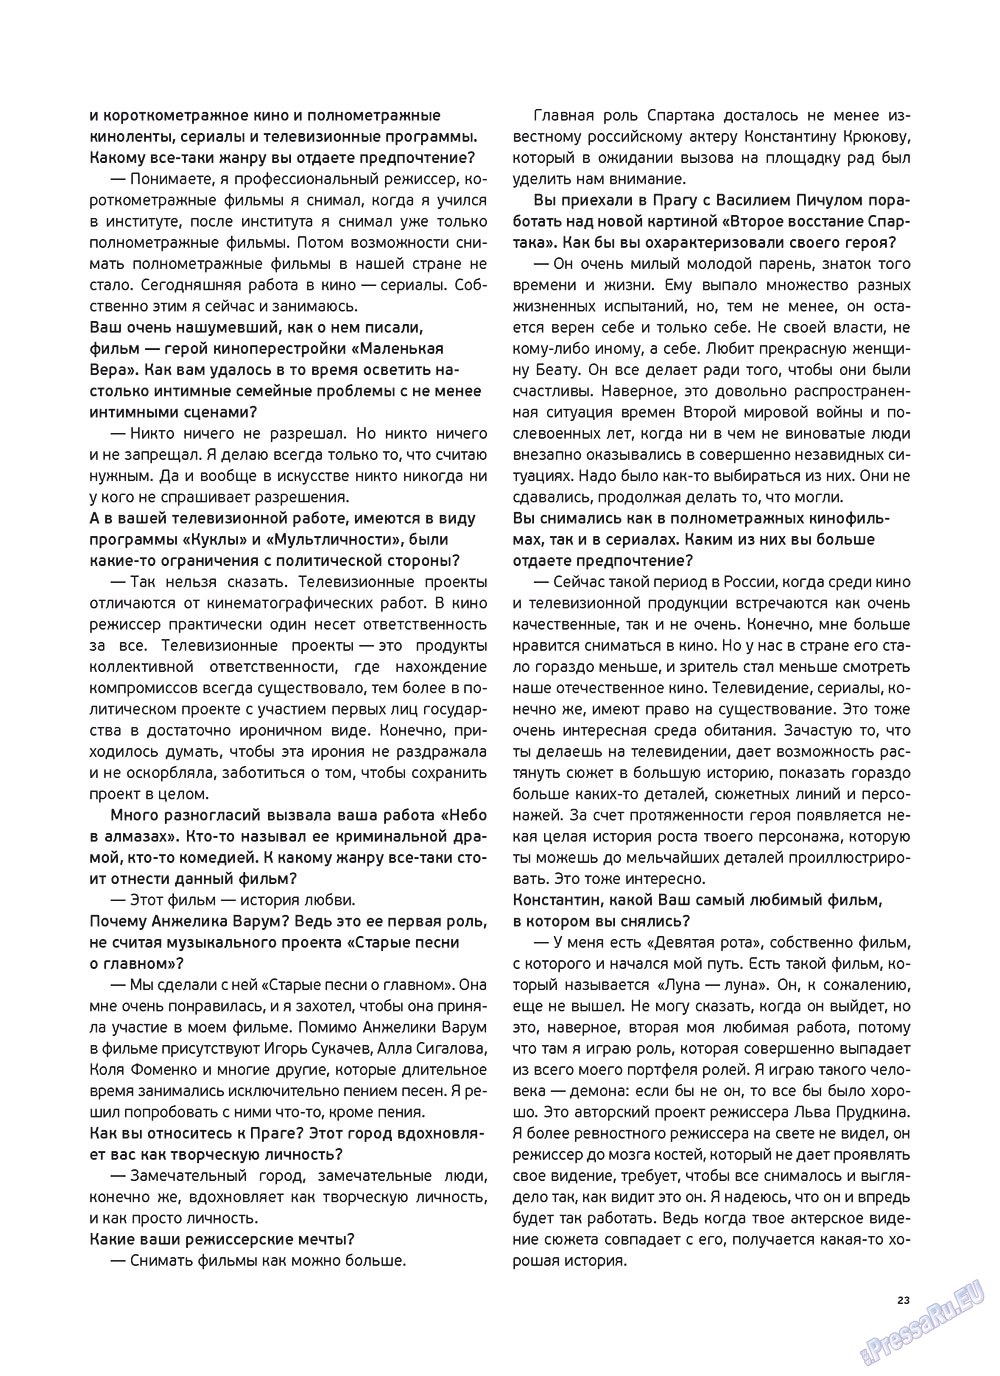 Артек (журнал). 2011 год, номер 6, стр. 25